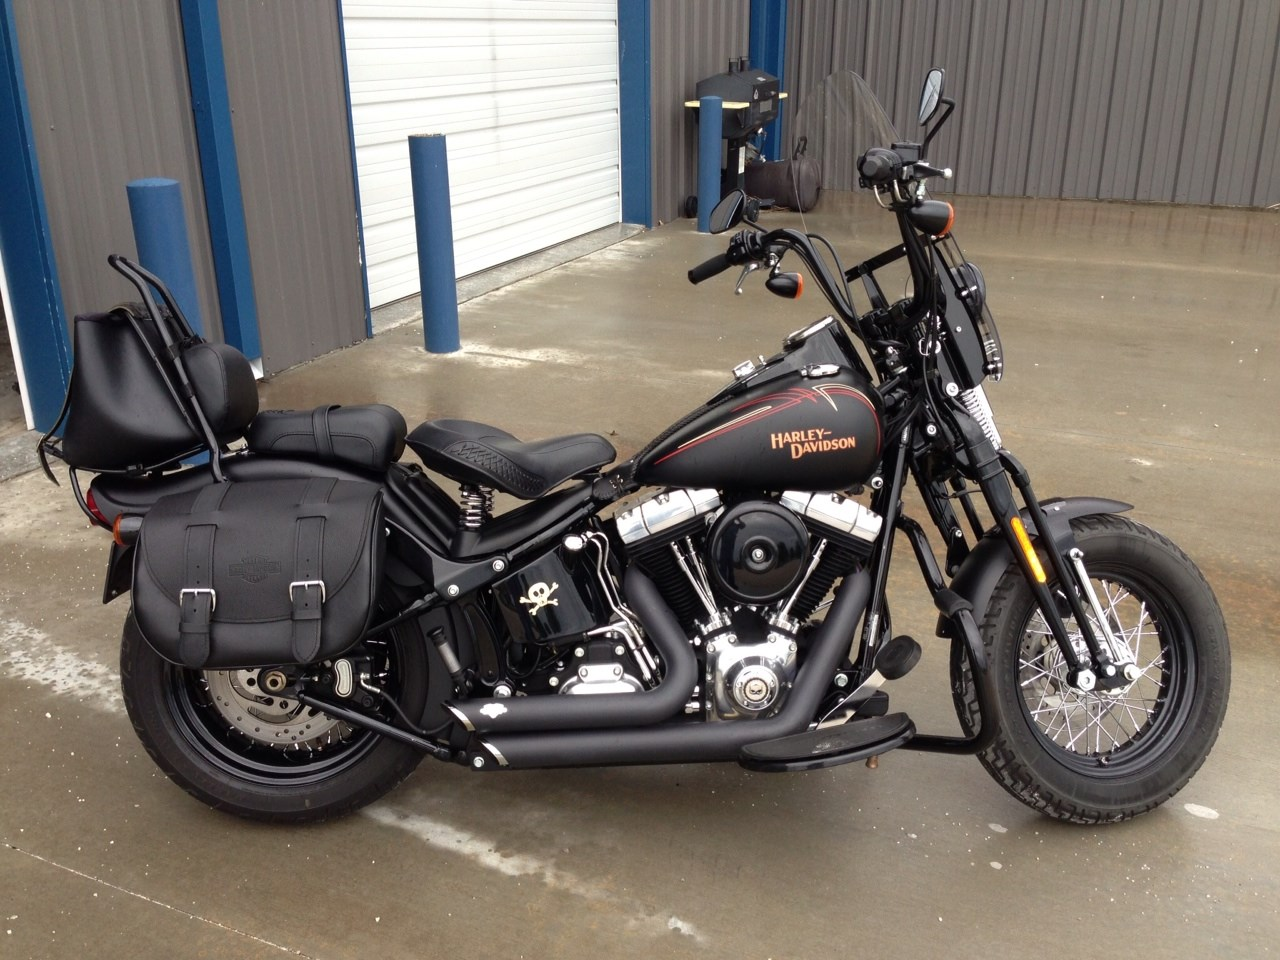 Crossbone Harley Davidson Price